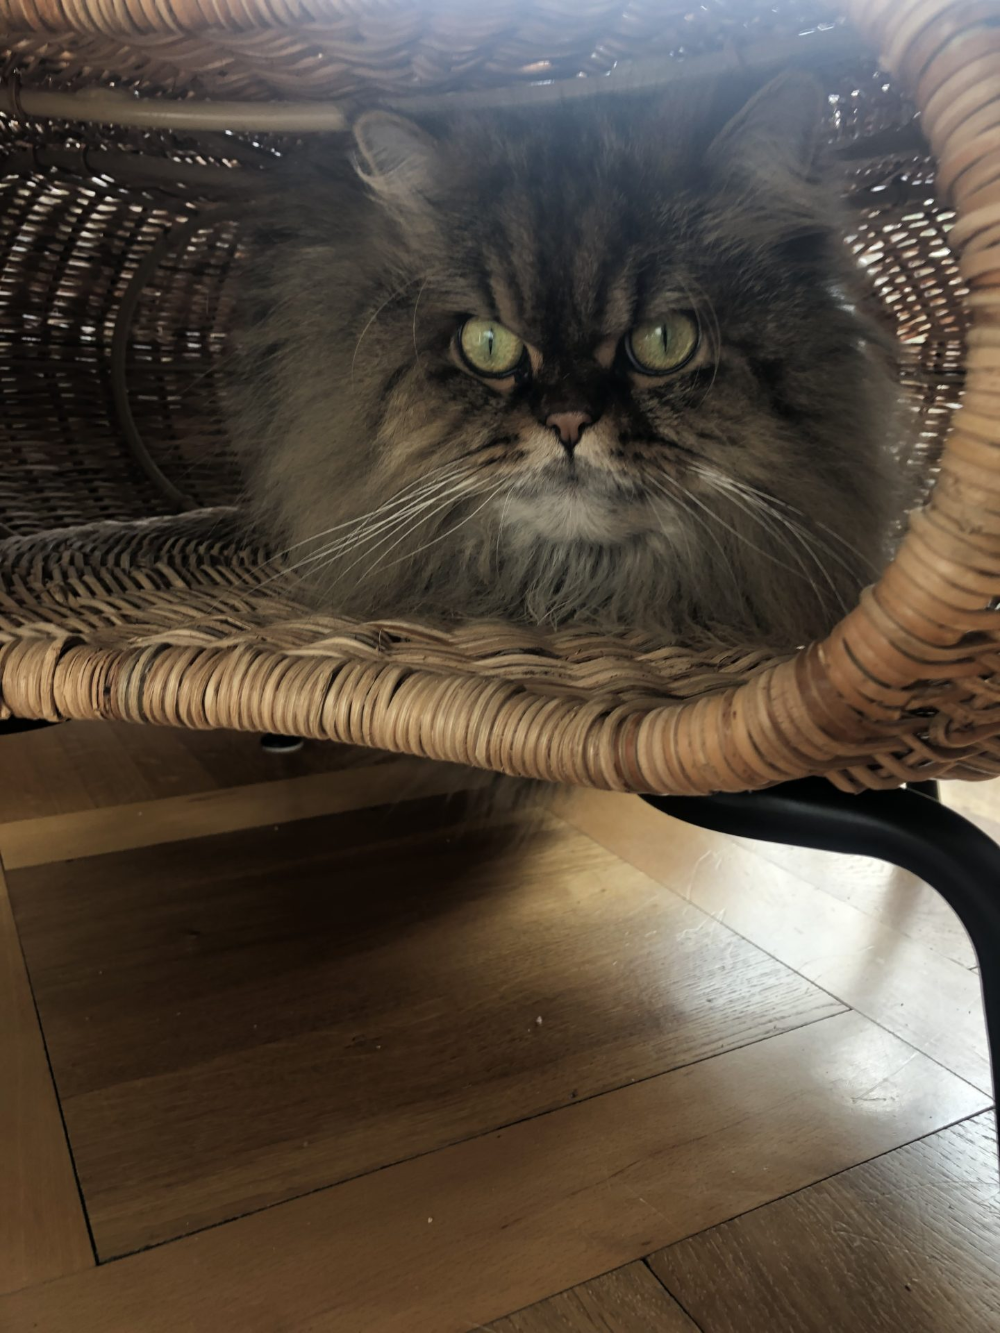 Ikea Cat Bed Hacks Meow Lifestyle In 2020 Ikea Cat Ikea Cat